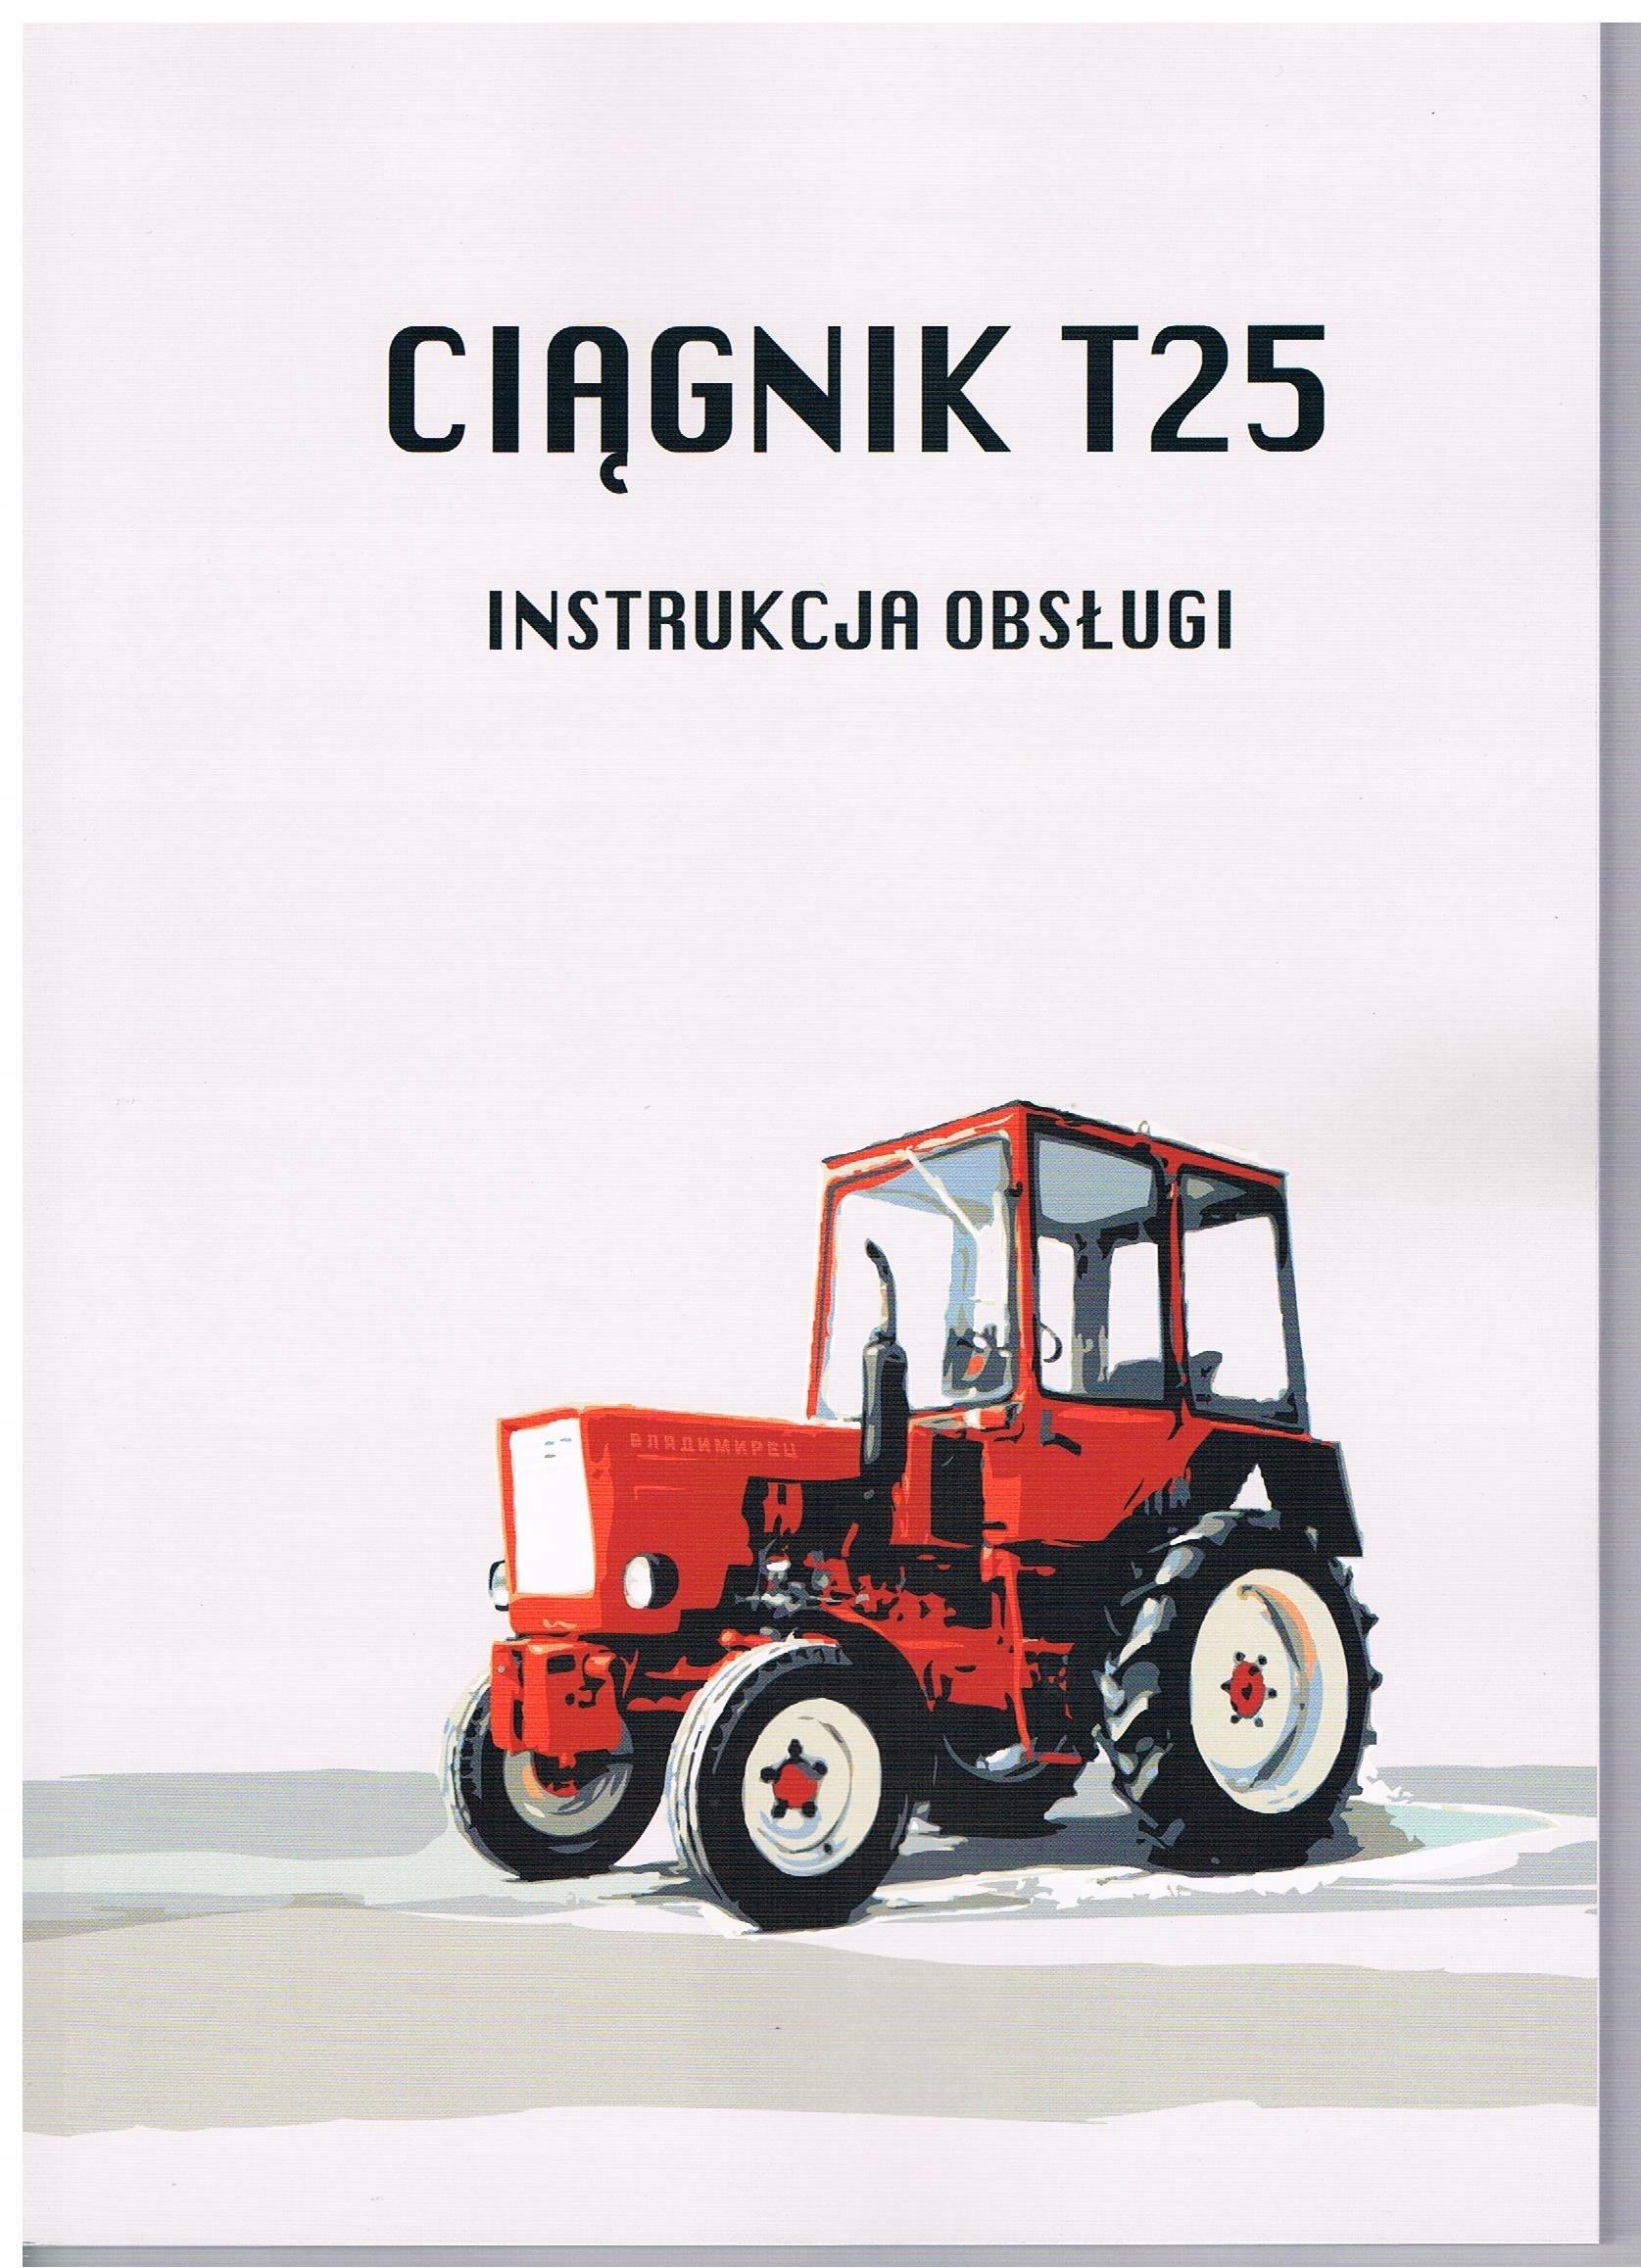 Instrukcja obsługi budowa Władimirec T25 T 25